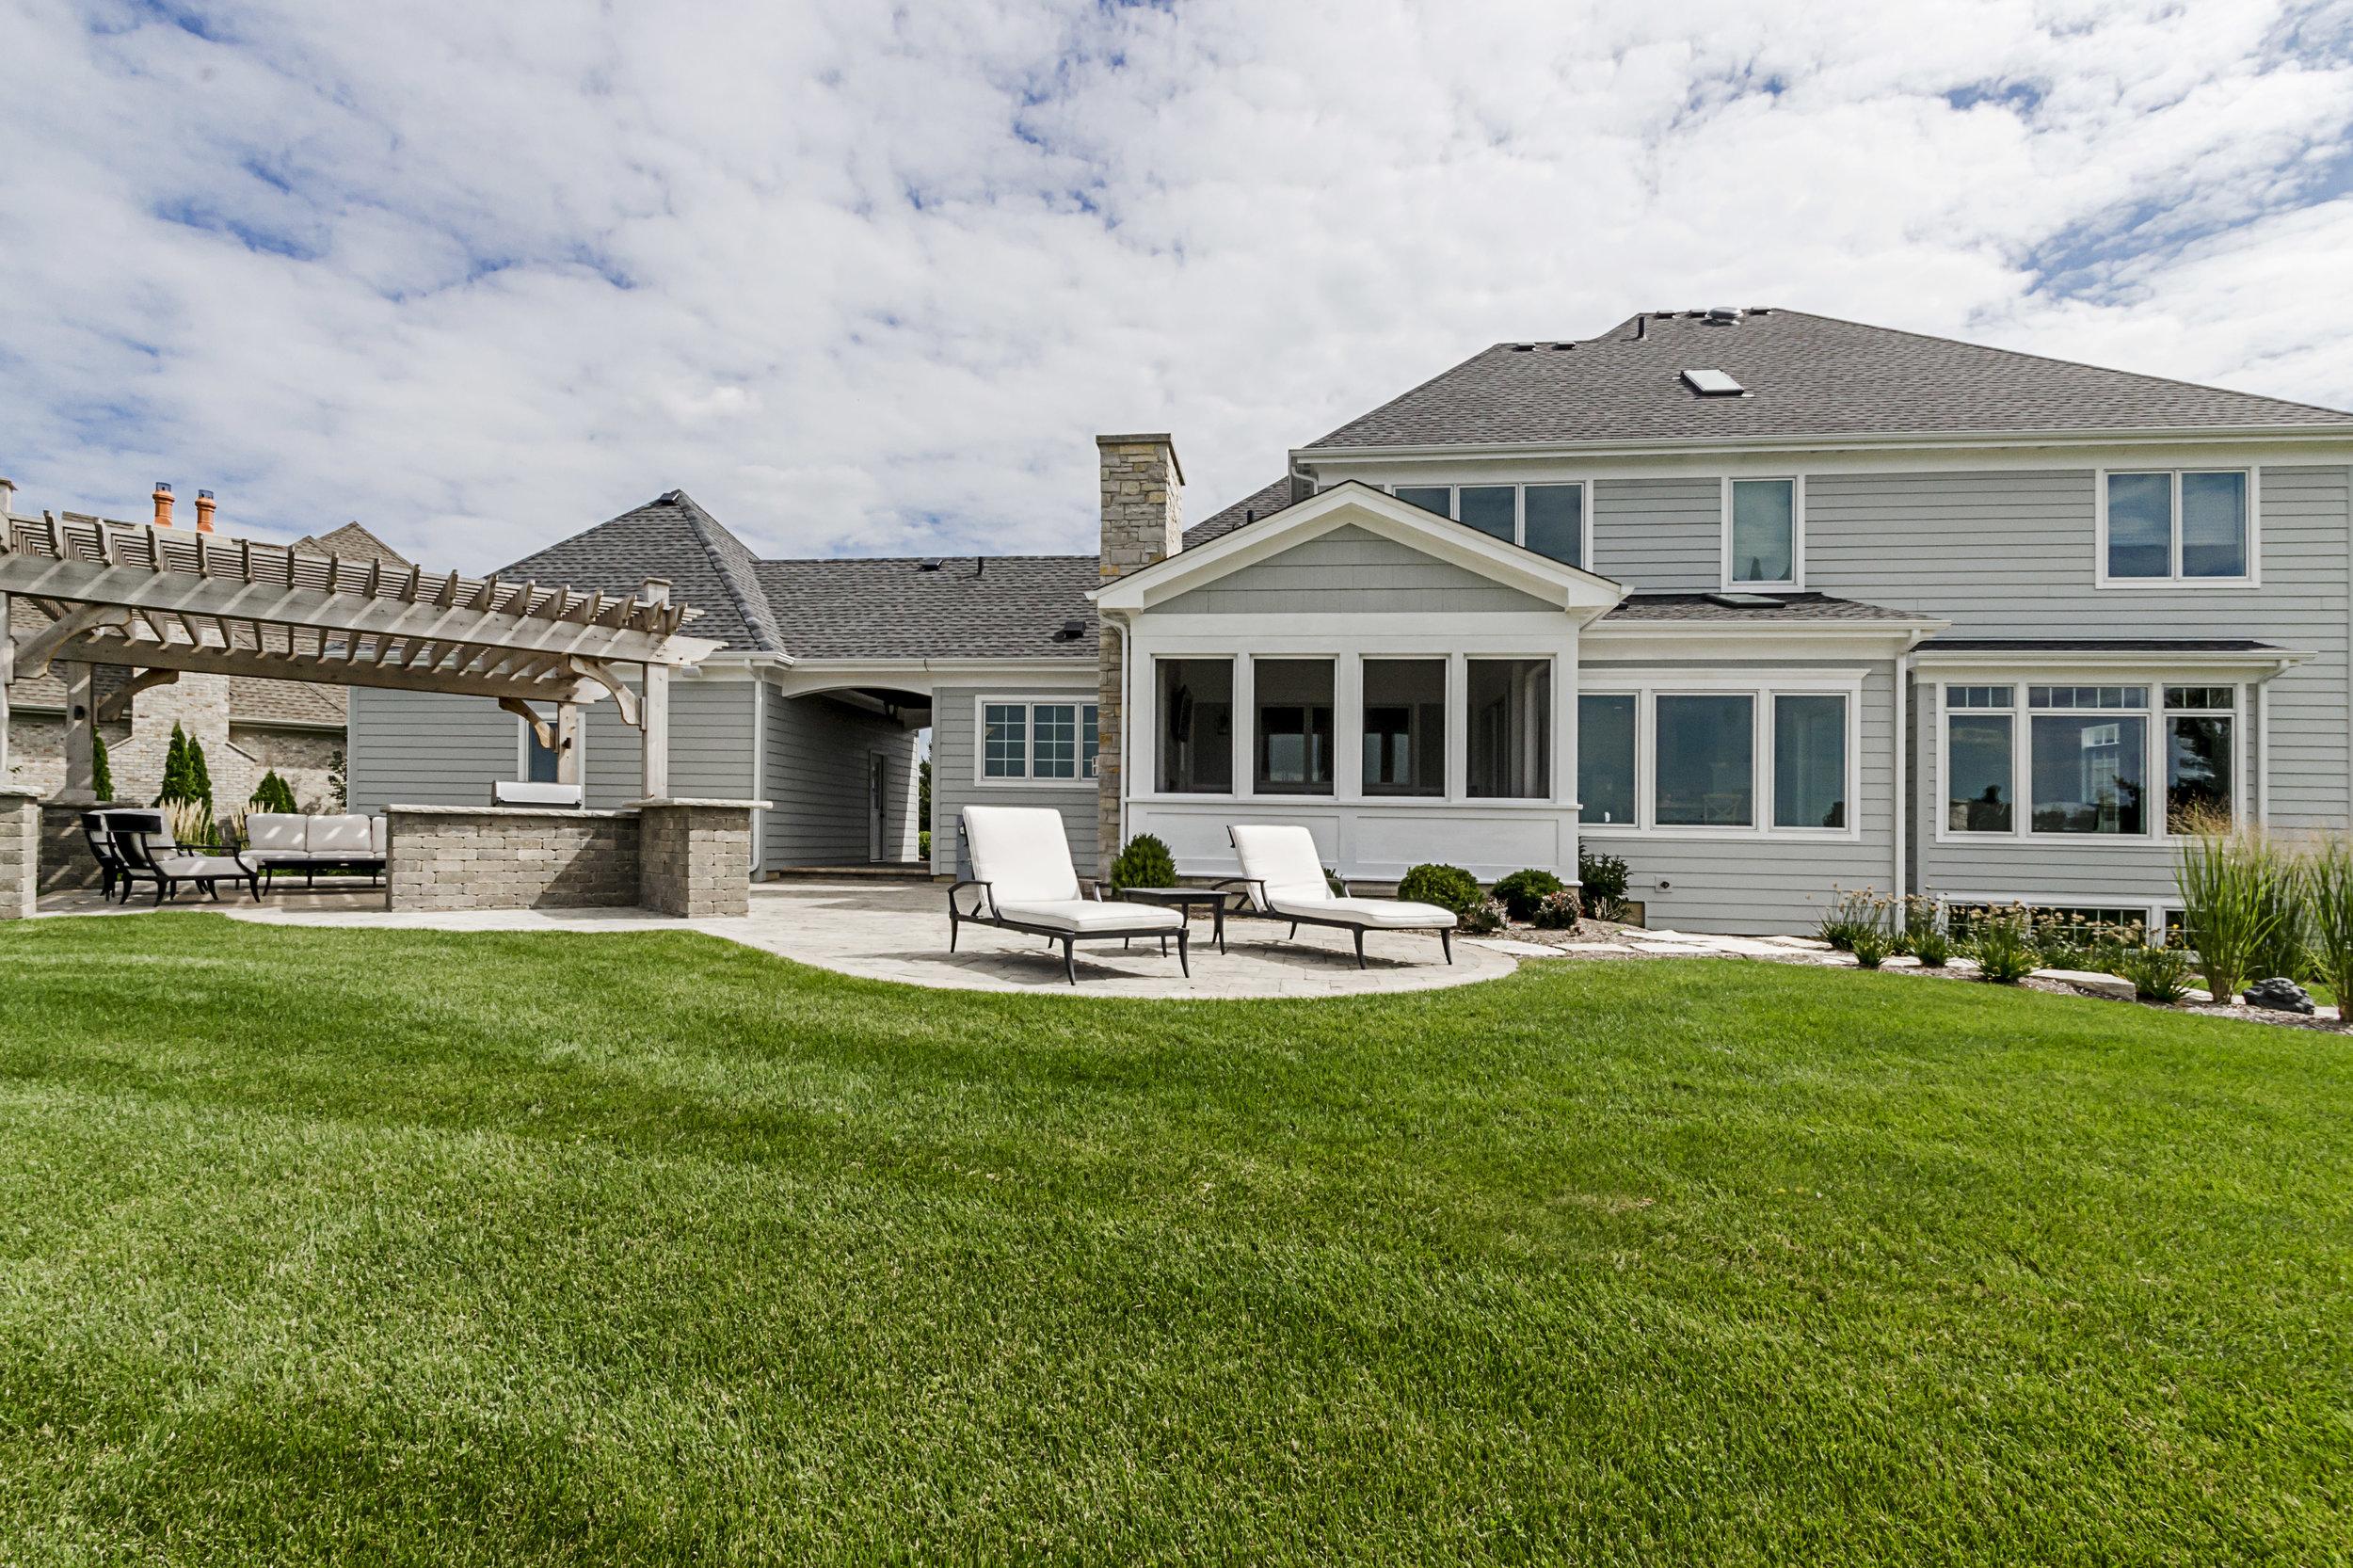 Back yard with house.jpg